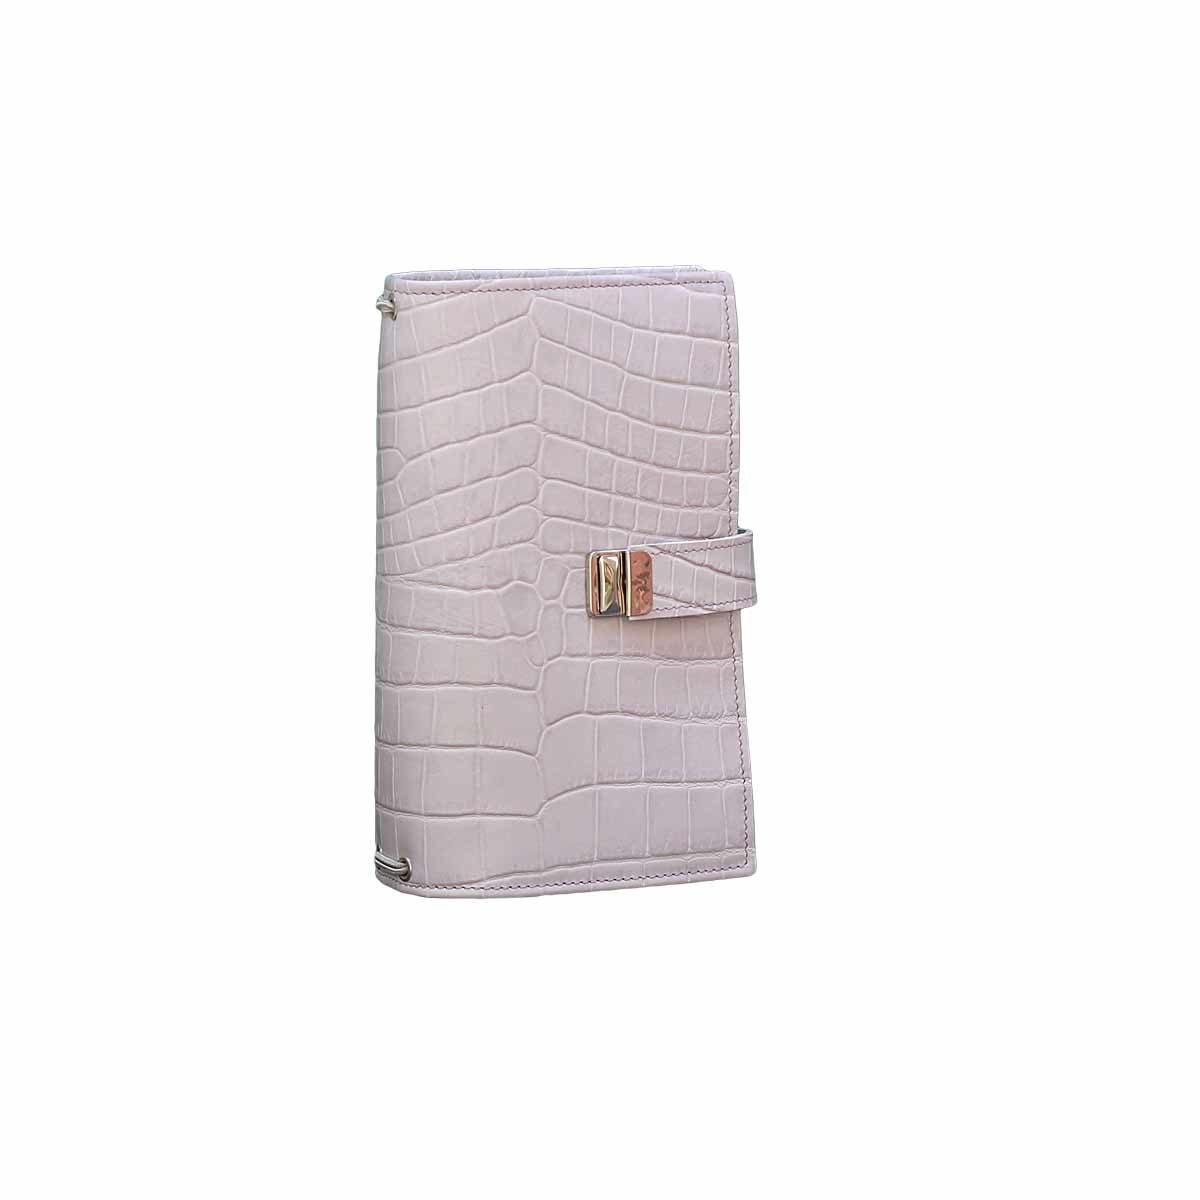 traverl notebook regular kroko leder flieder